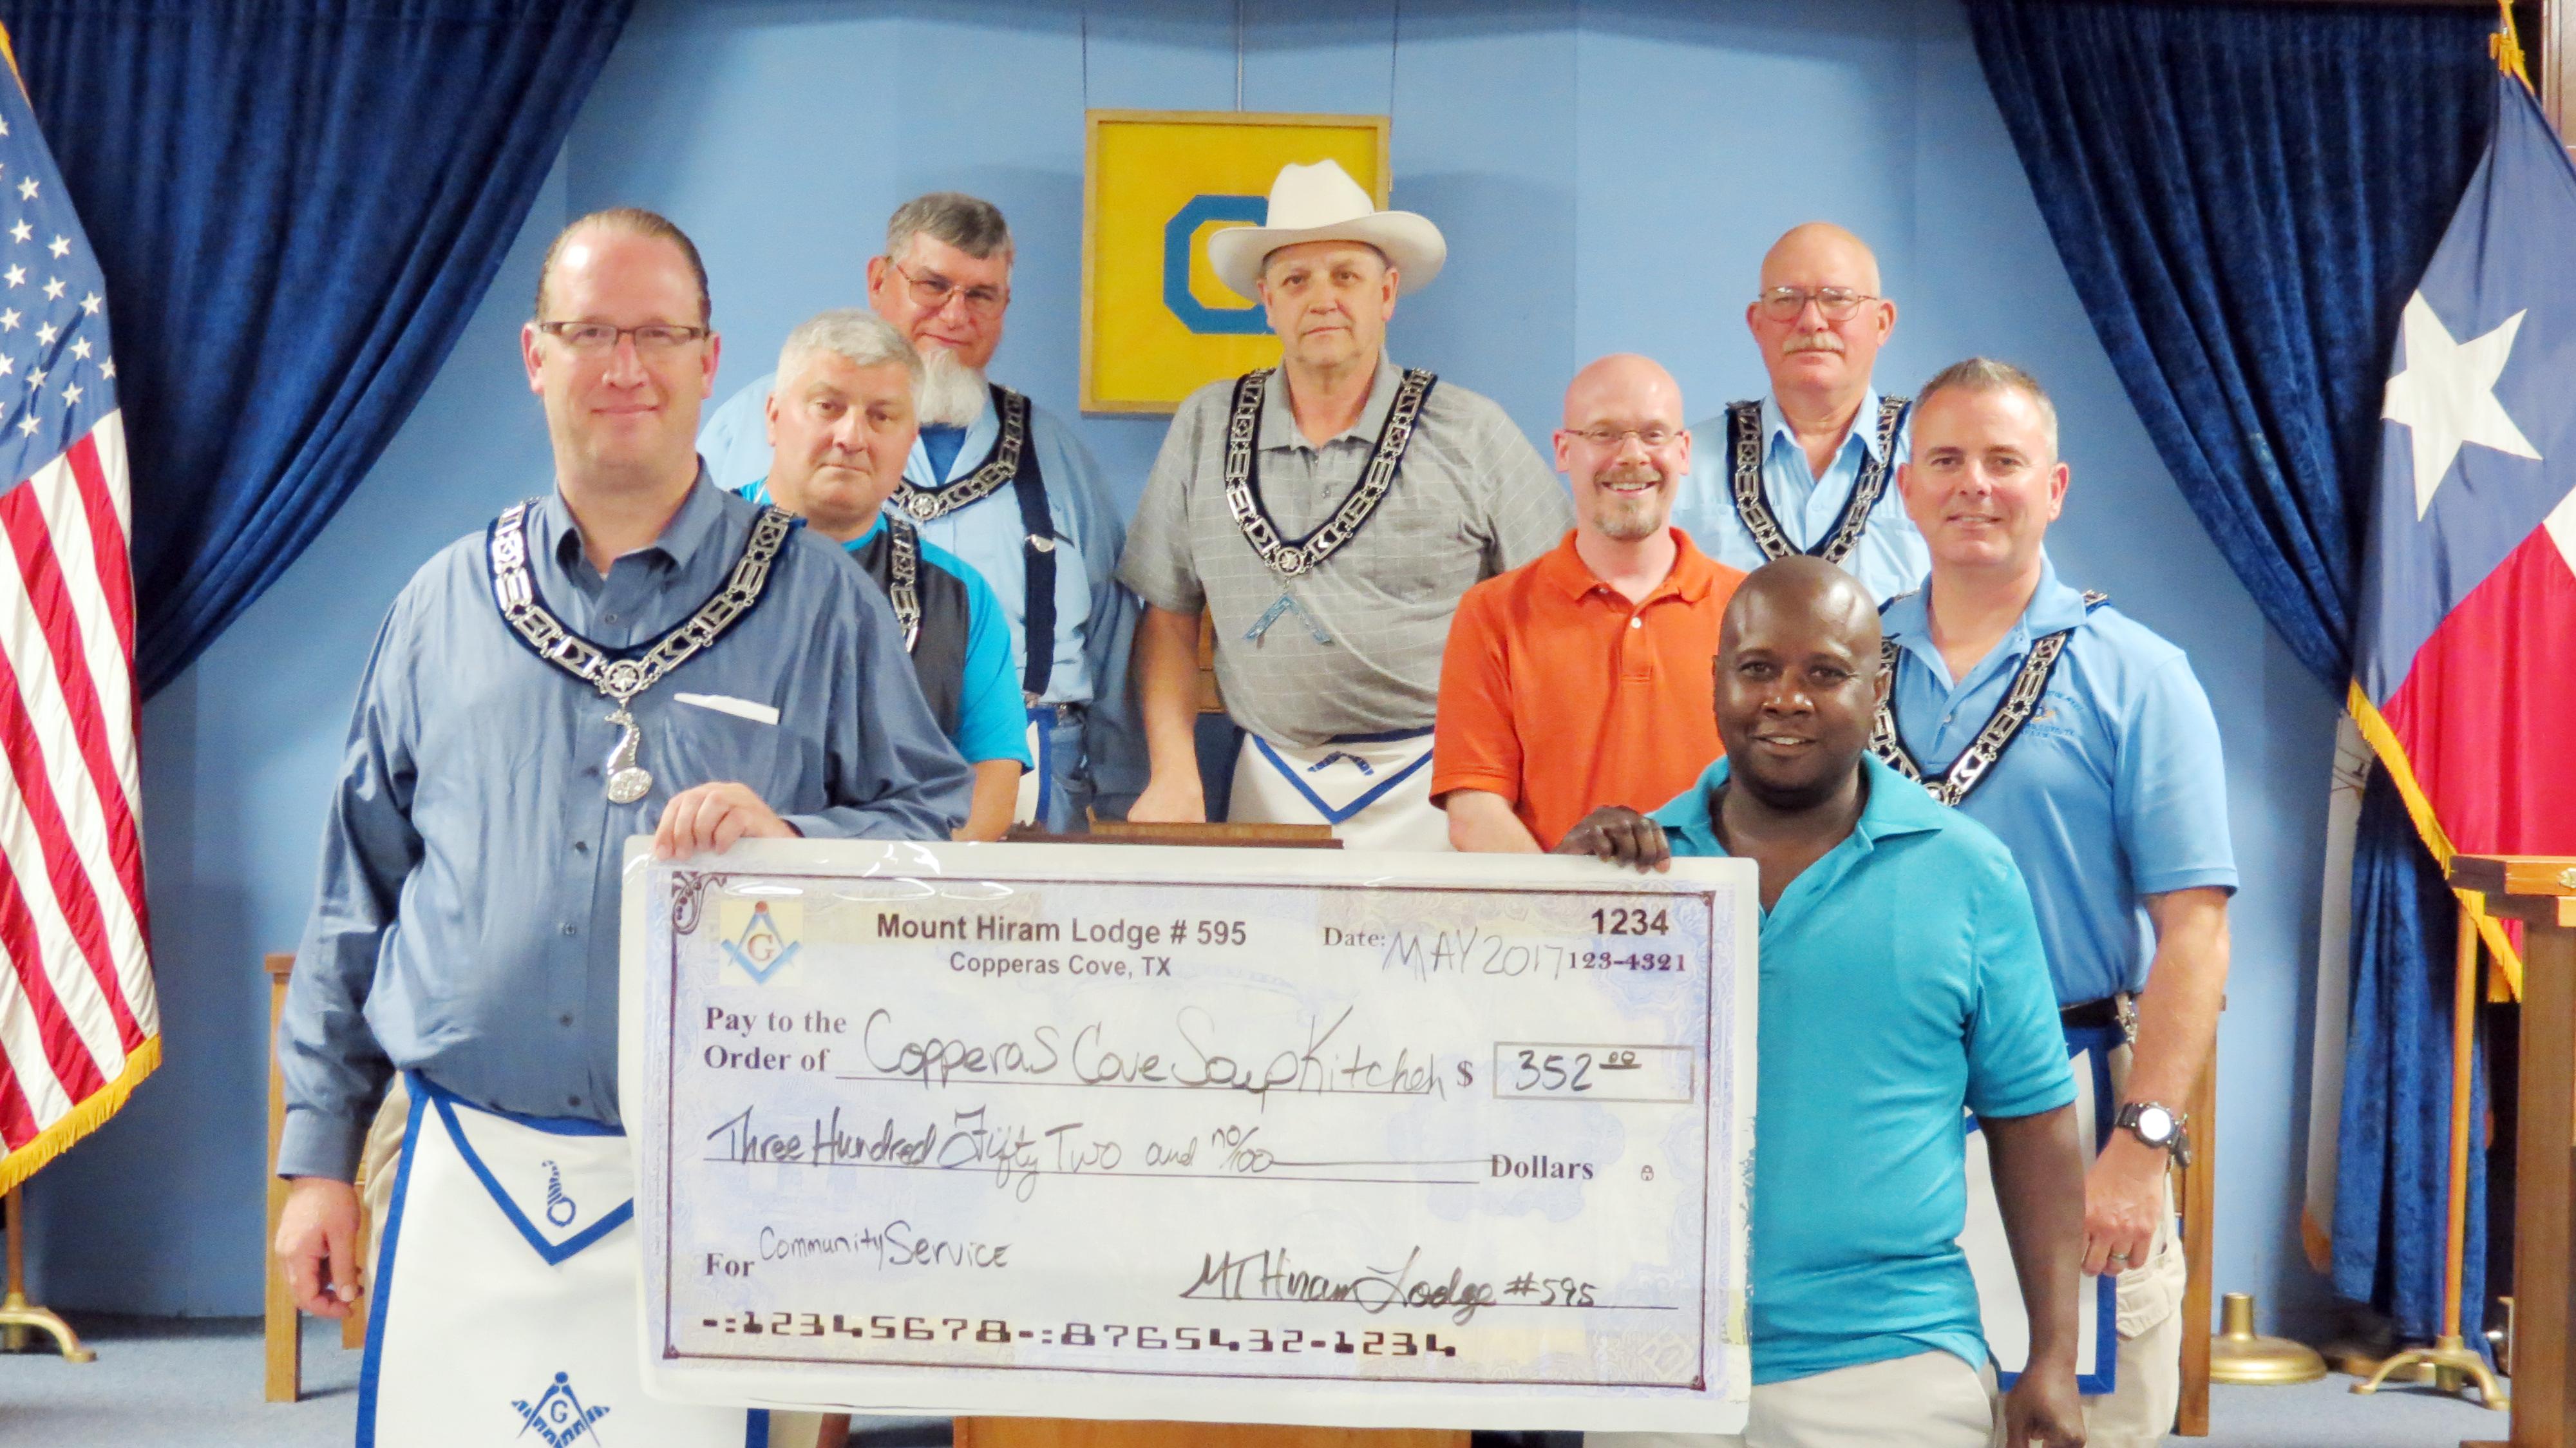 Masonic Lodge presents check to soup kitchen | Copperas Cove Leader ...